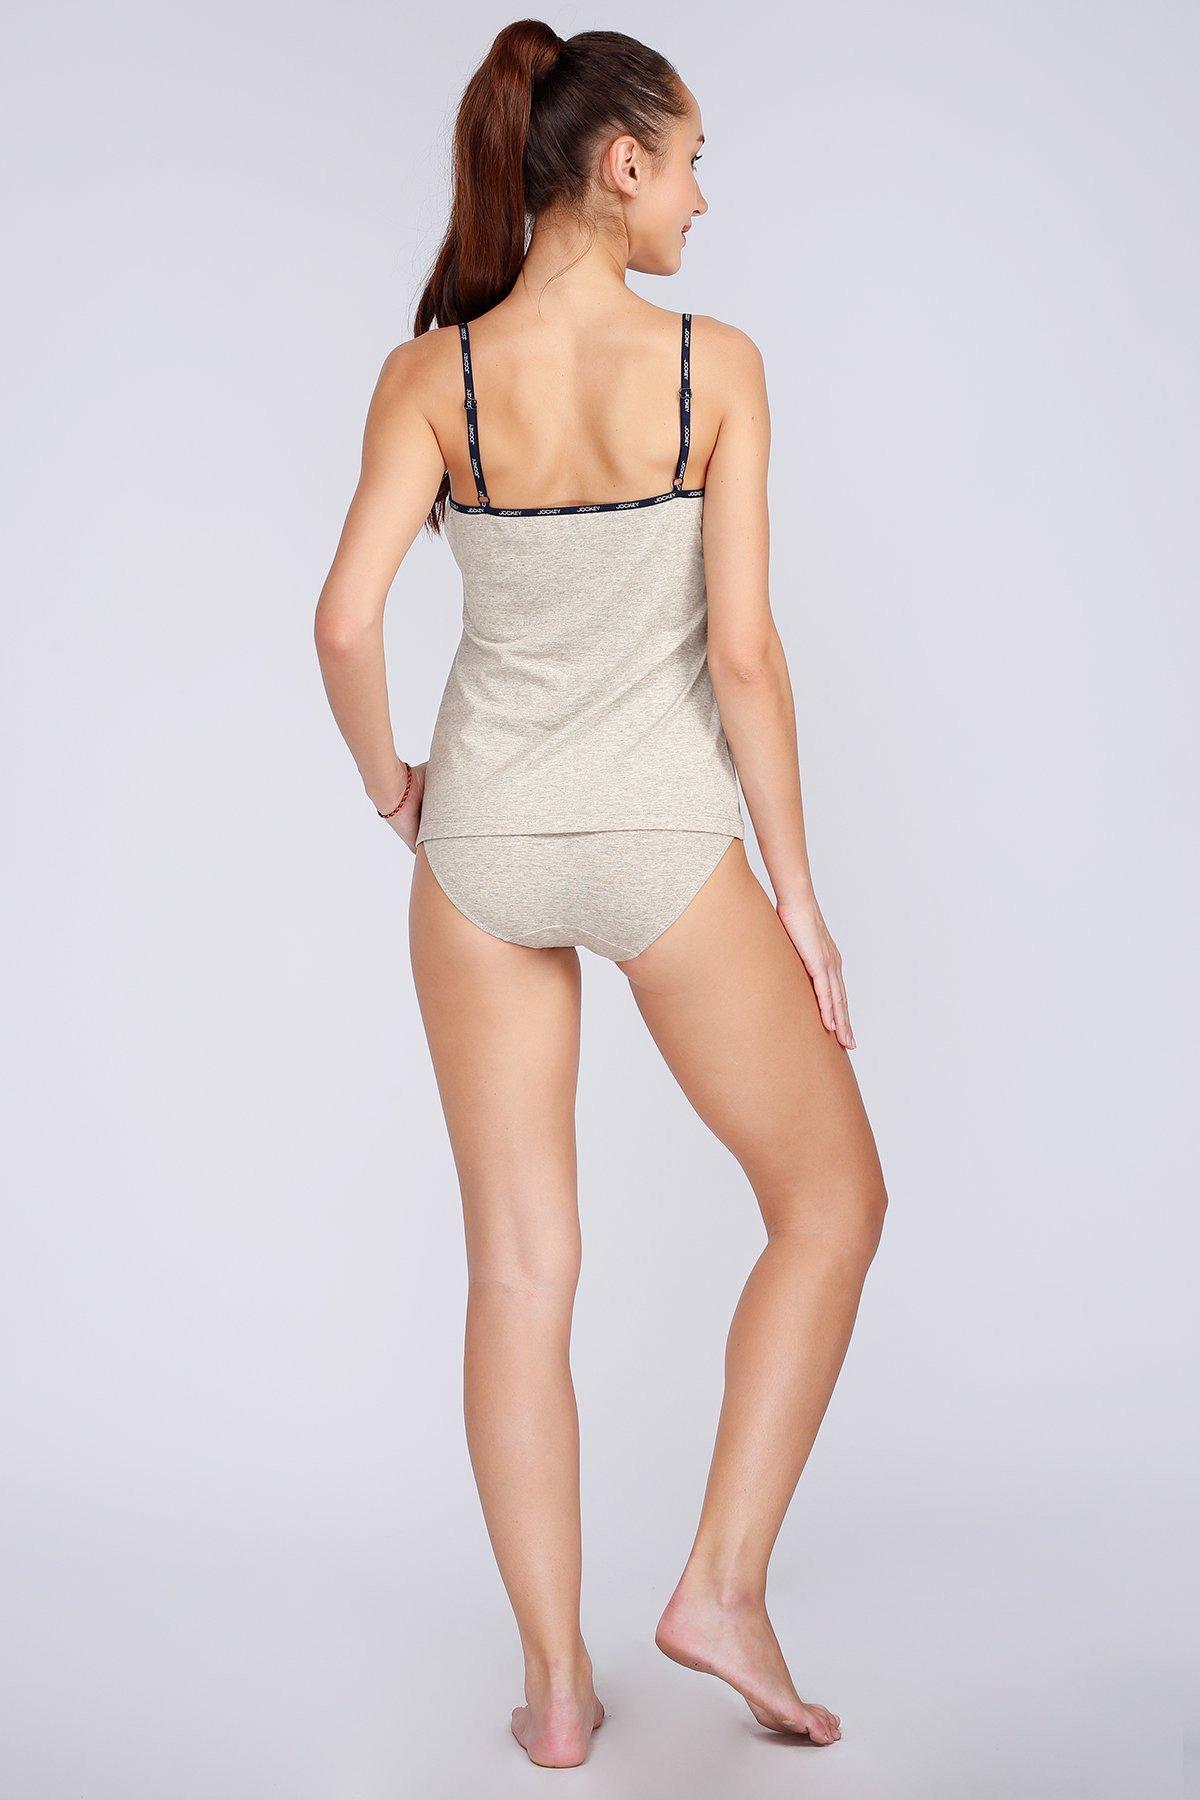 Áo Jockey Camisole nữ Cotton